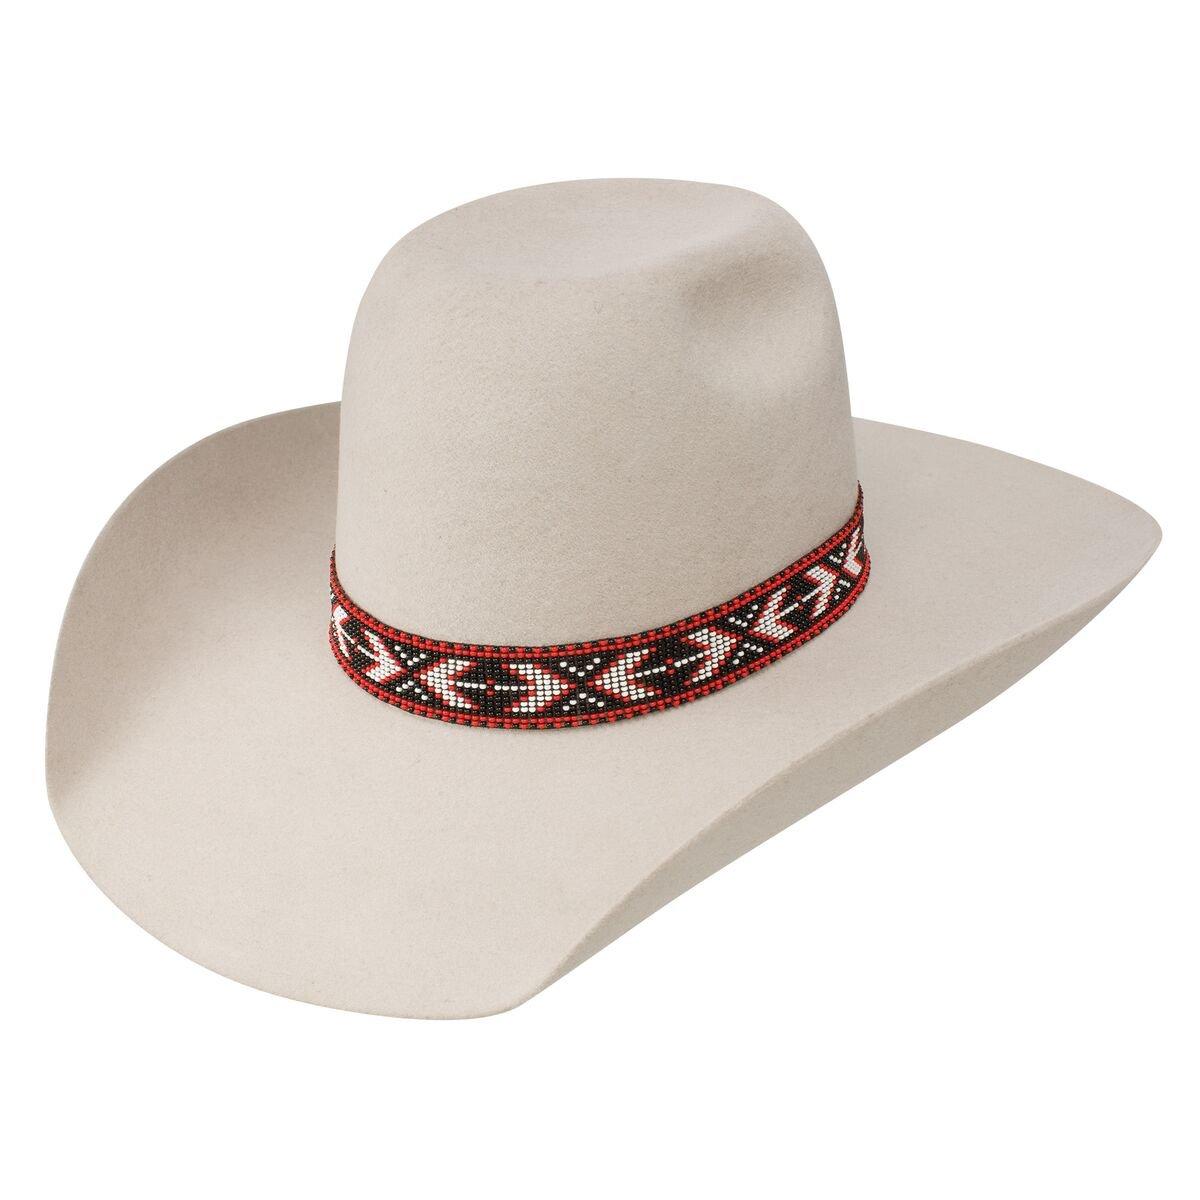 Resistol hooey presidio wool cowboy hat at amazon mens clothing store jpg  1200x1200 Top cowboy hats 23c6630d1e26